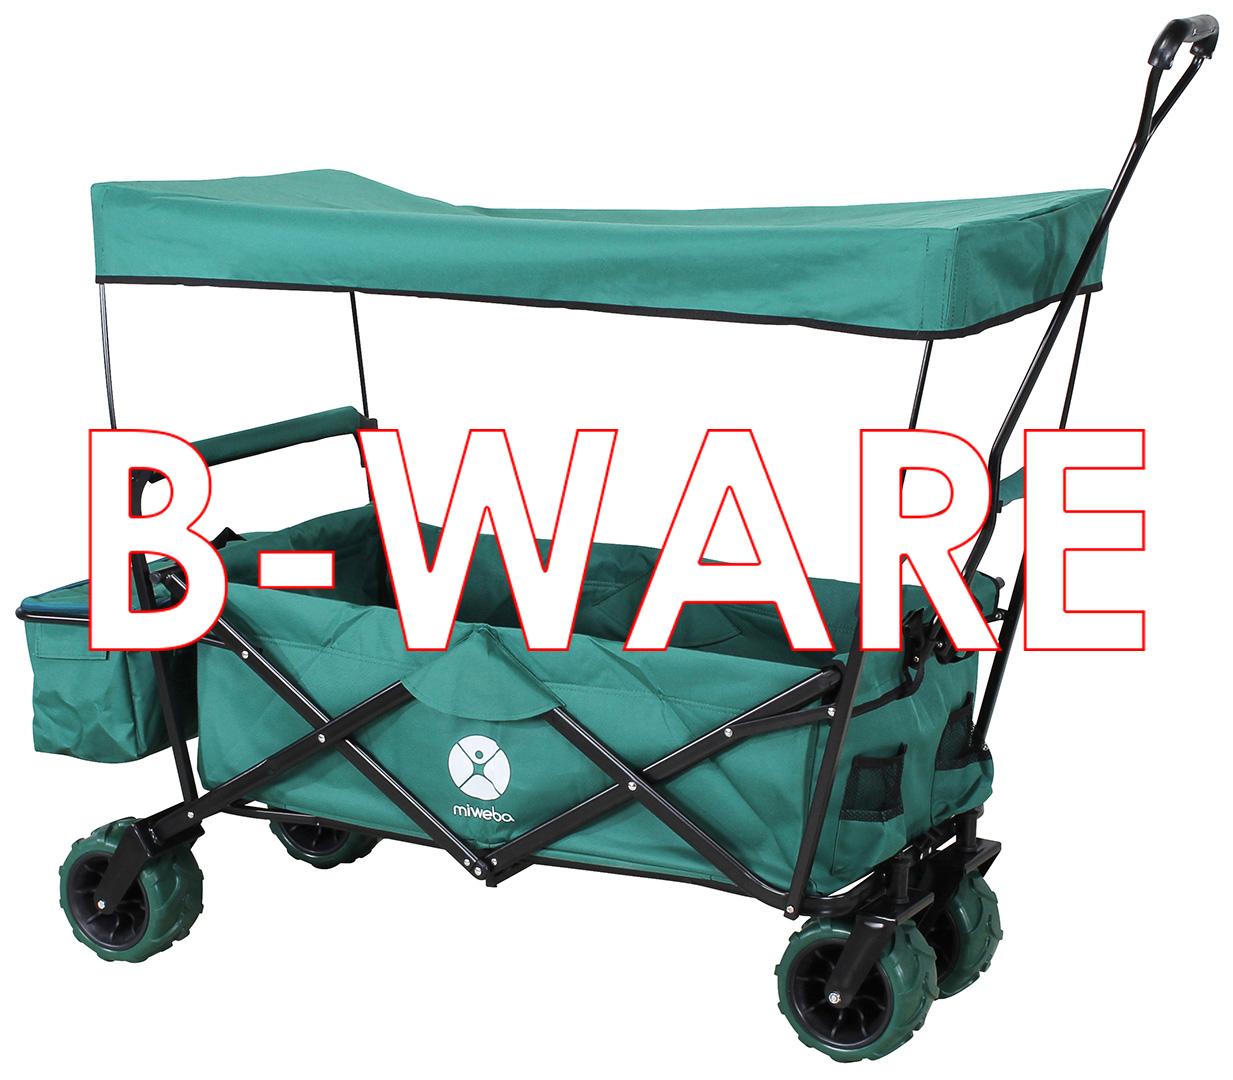 bollerwagen b ware angebote b ware miweba gmbh. Black Bedroom Furniture Sets. Home Design Ideas